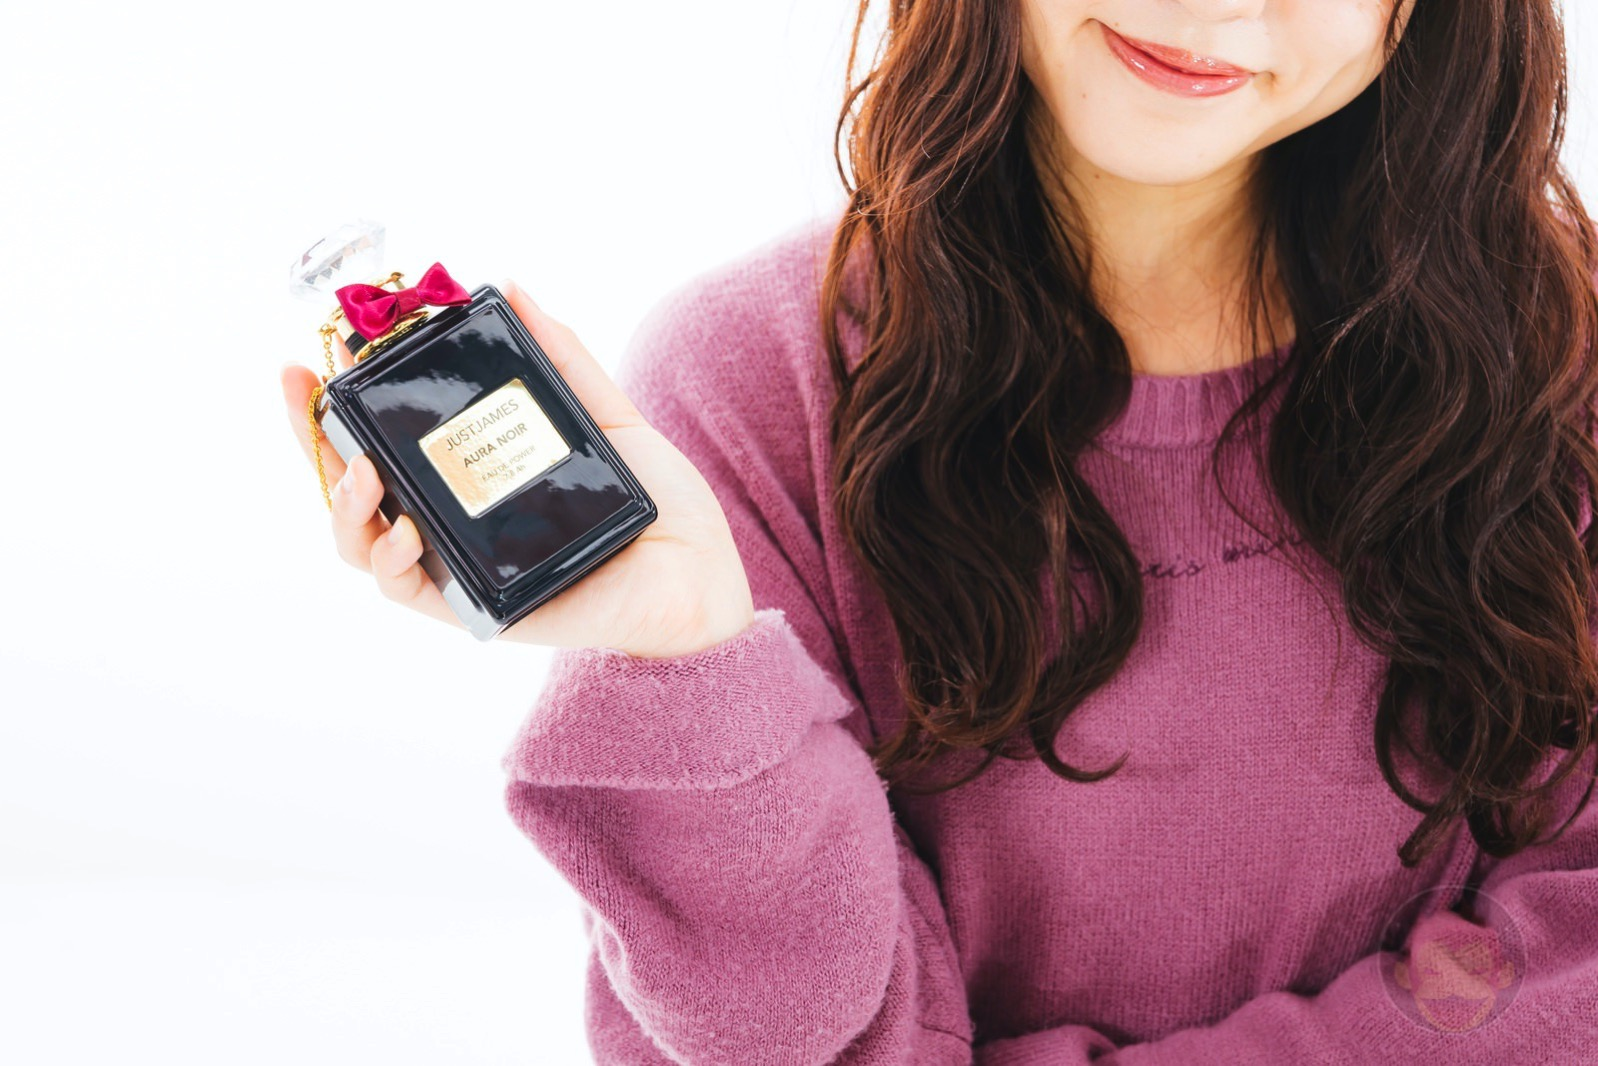 JUSTJAMES-AURA-NOIR-Mobile-Battery-Review-08.jpg